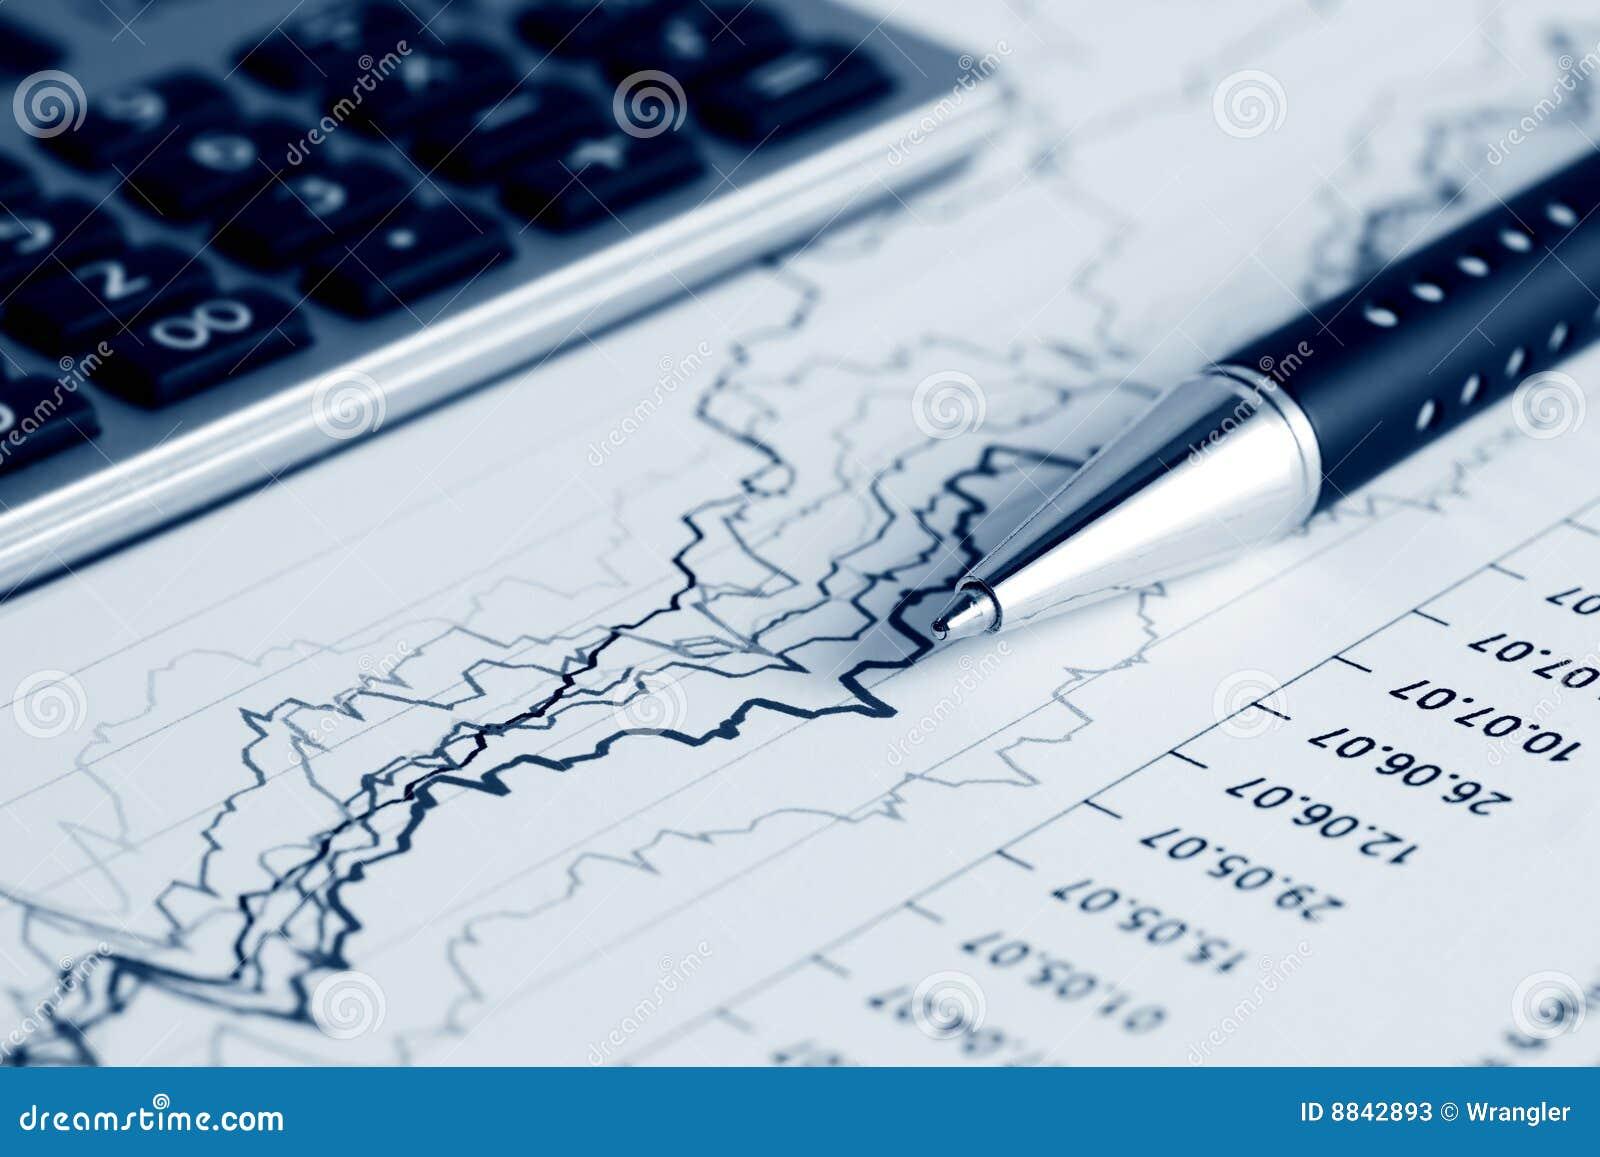 German accounting essay